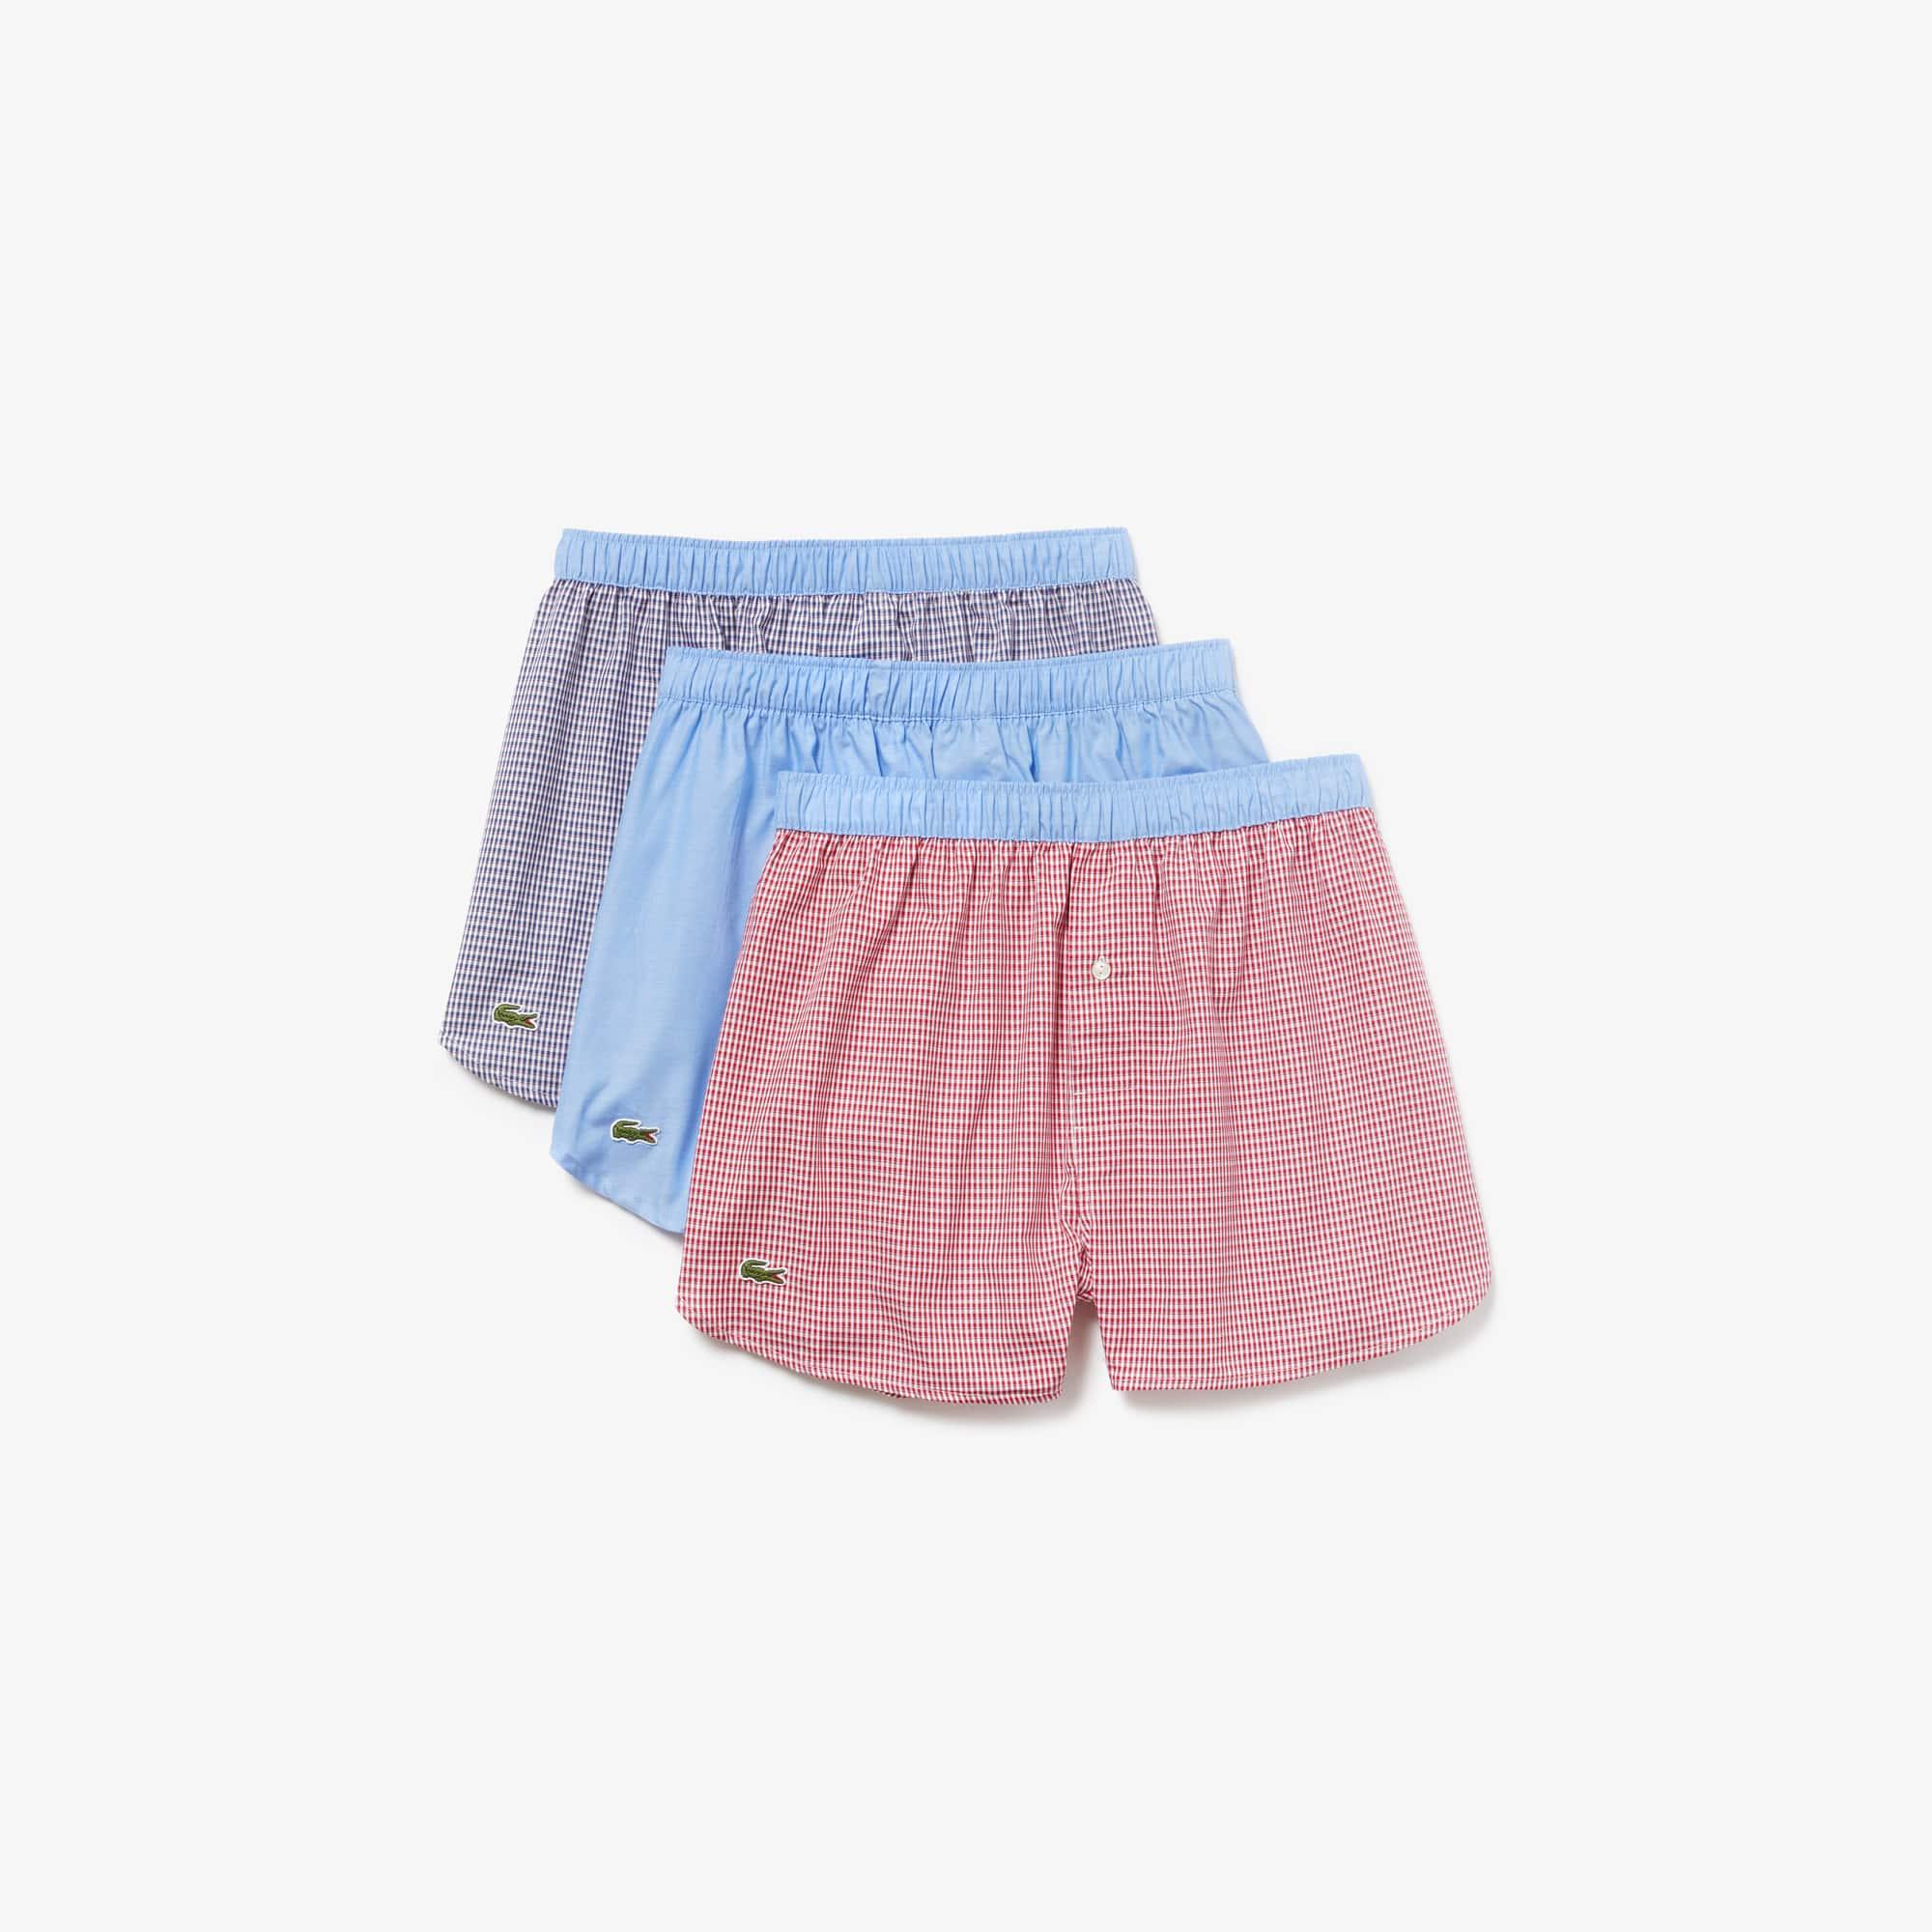 1a3c626f Men's Boxers and Briefs | Underwear | LACOSTE